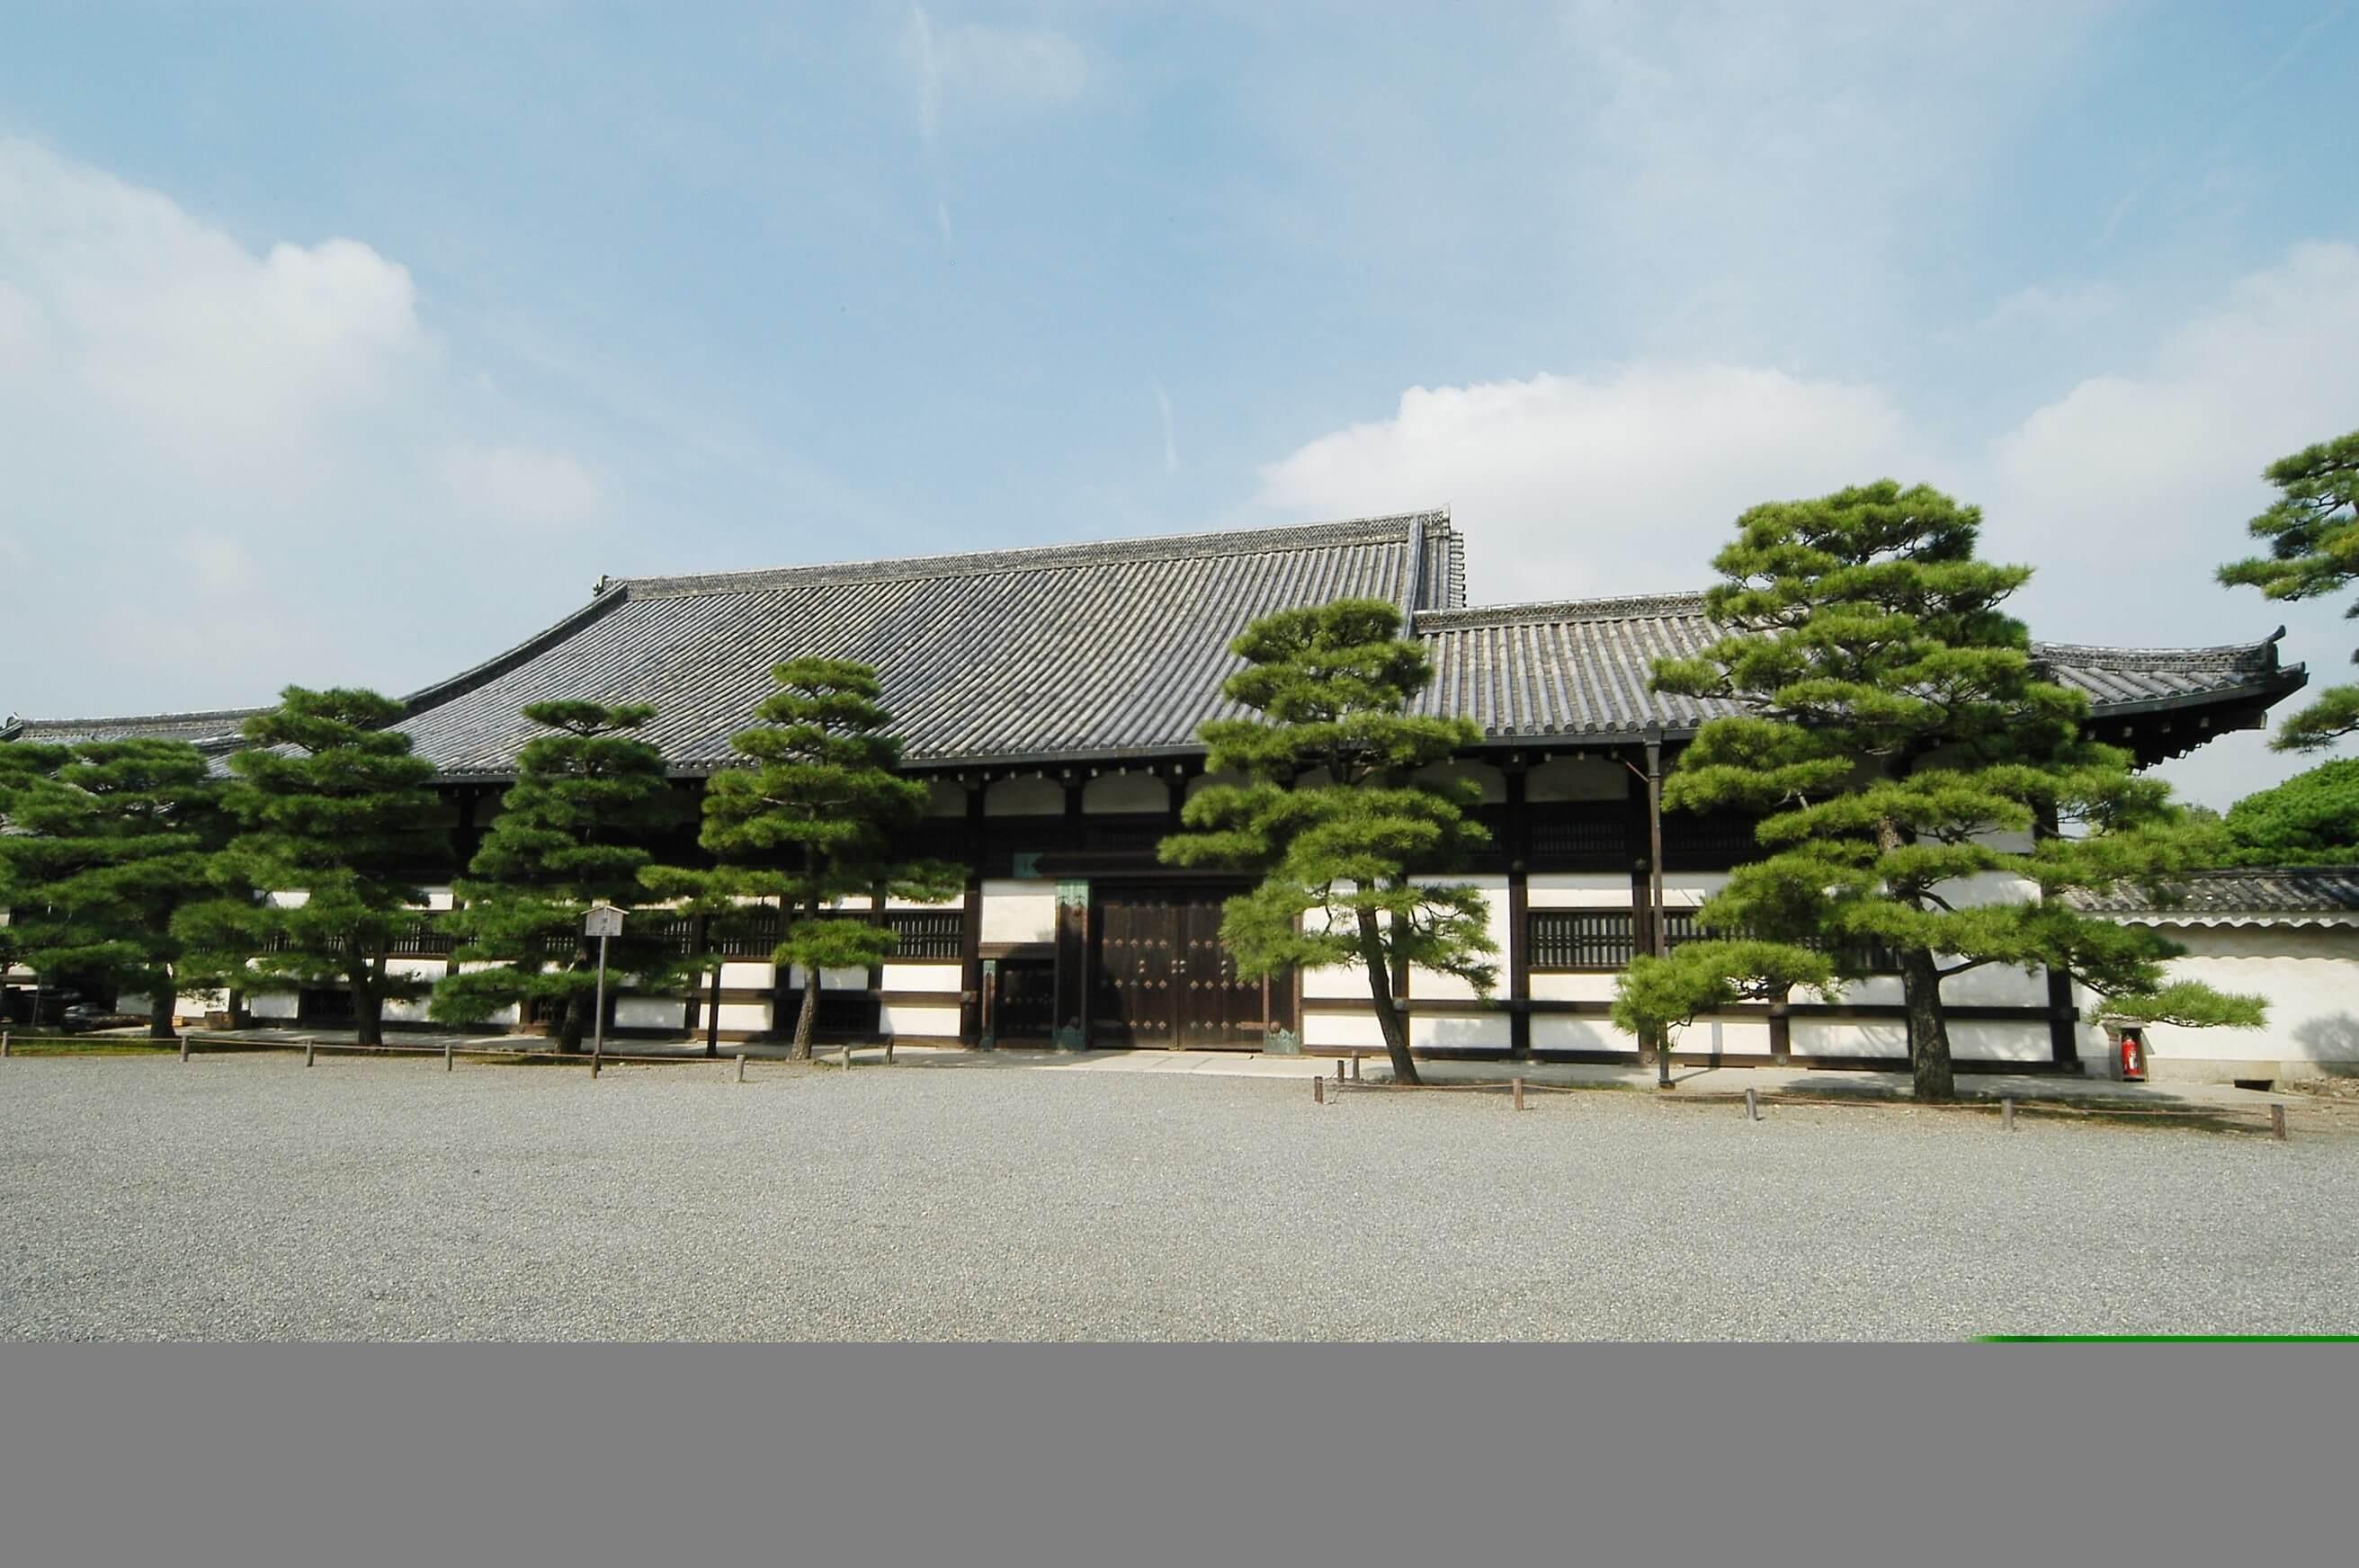 二条城 art kyoto nijojo